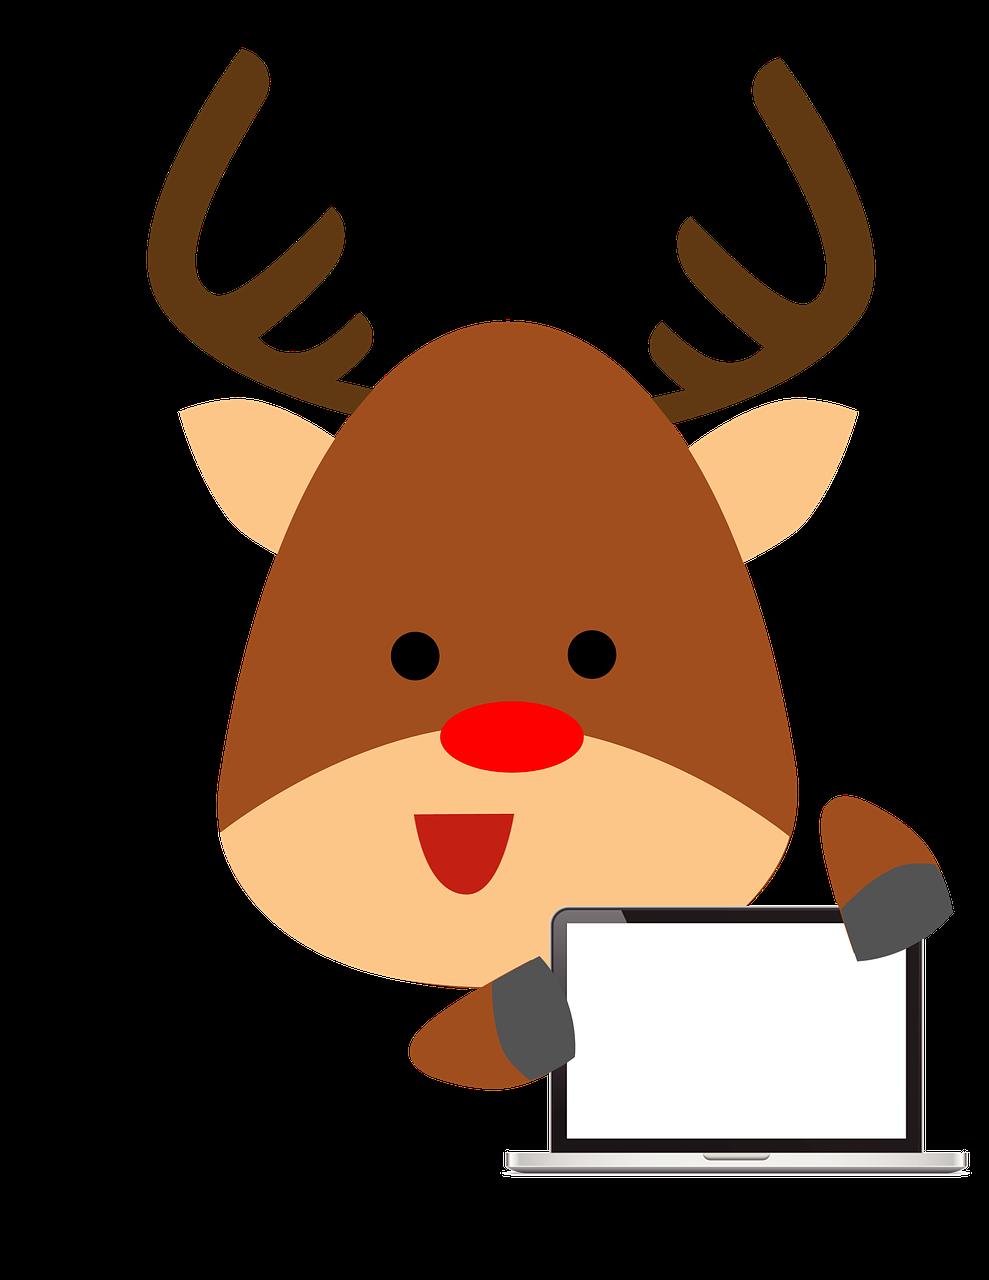 Hunting clipart sambar deer. Computer animal cartoon pinterest